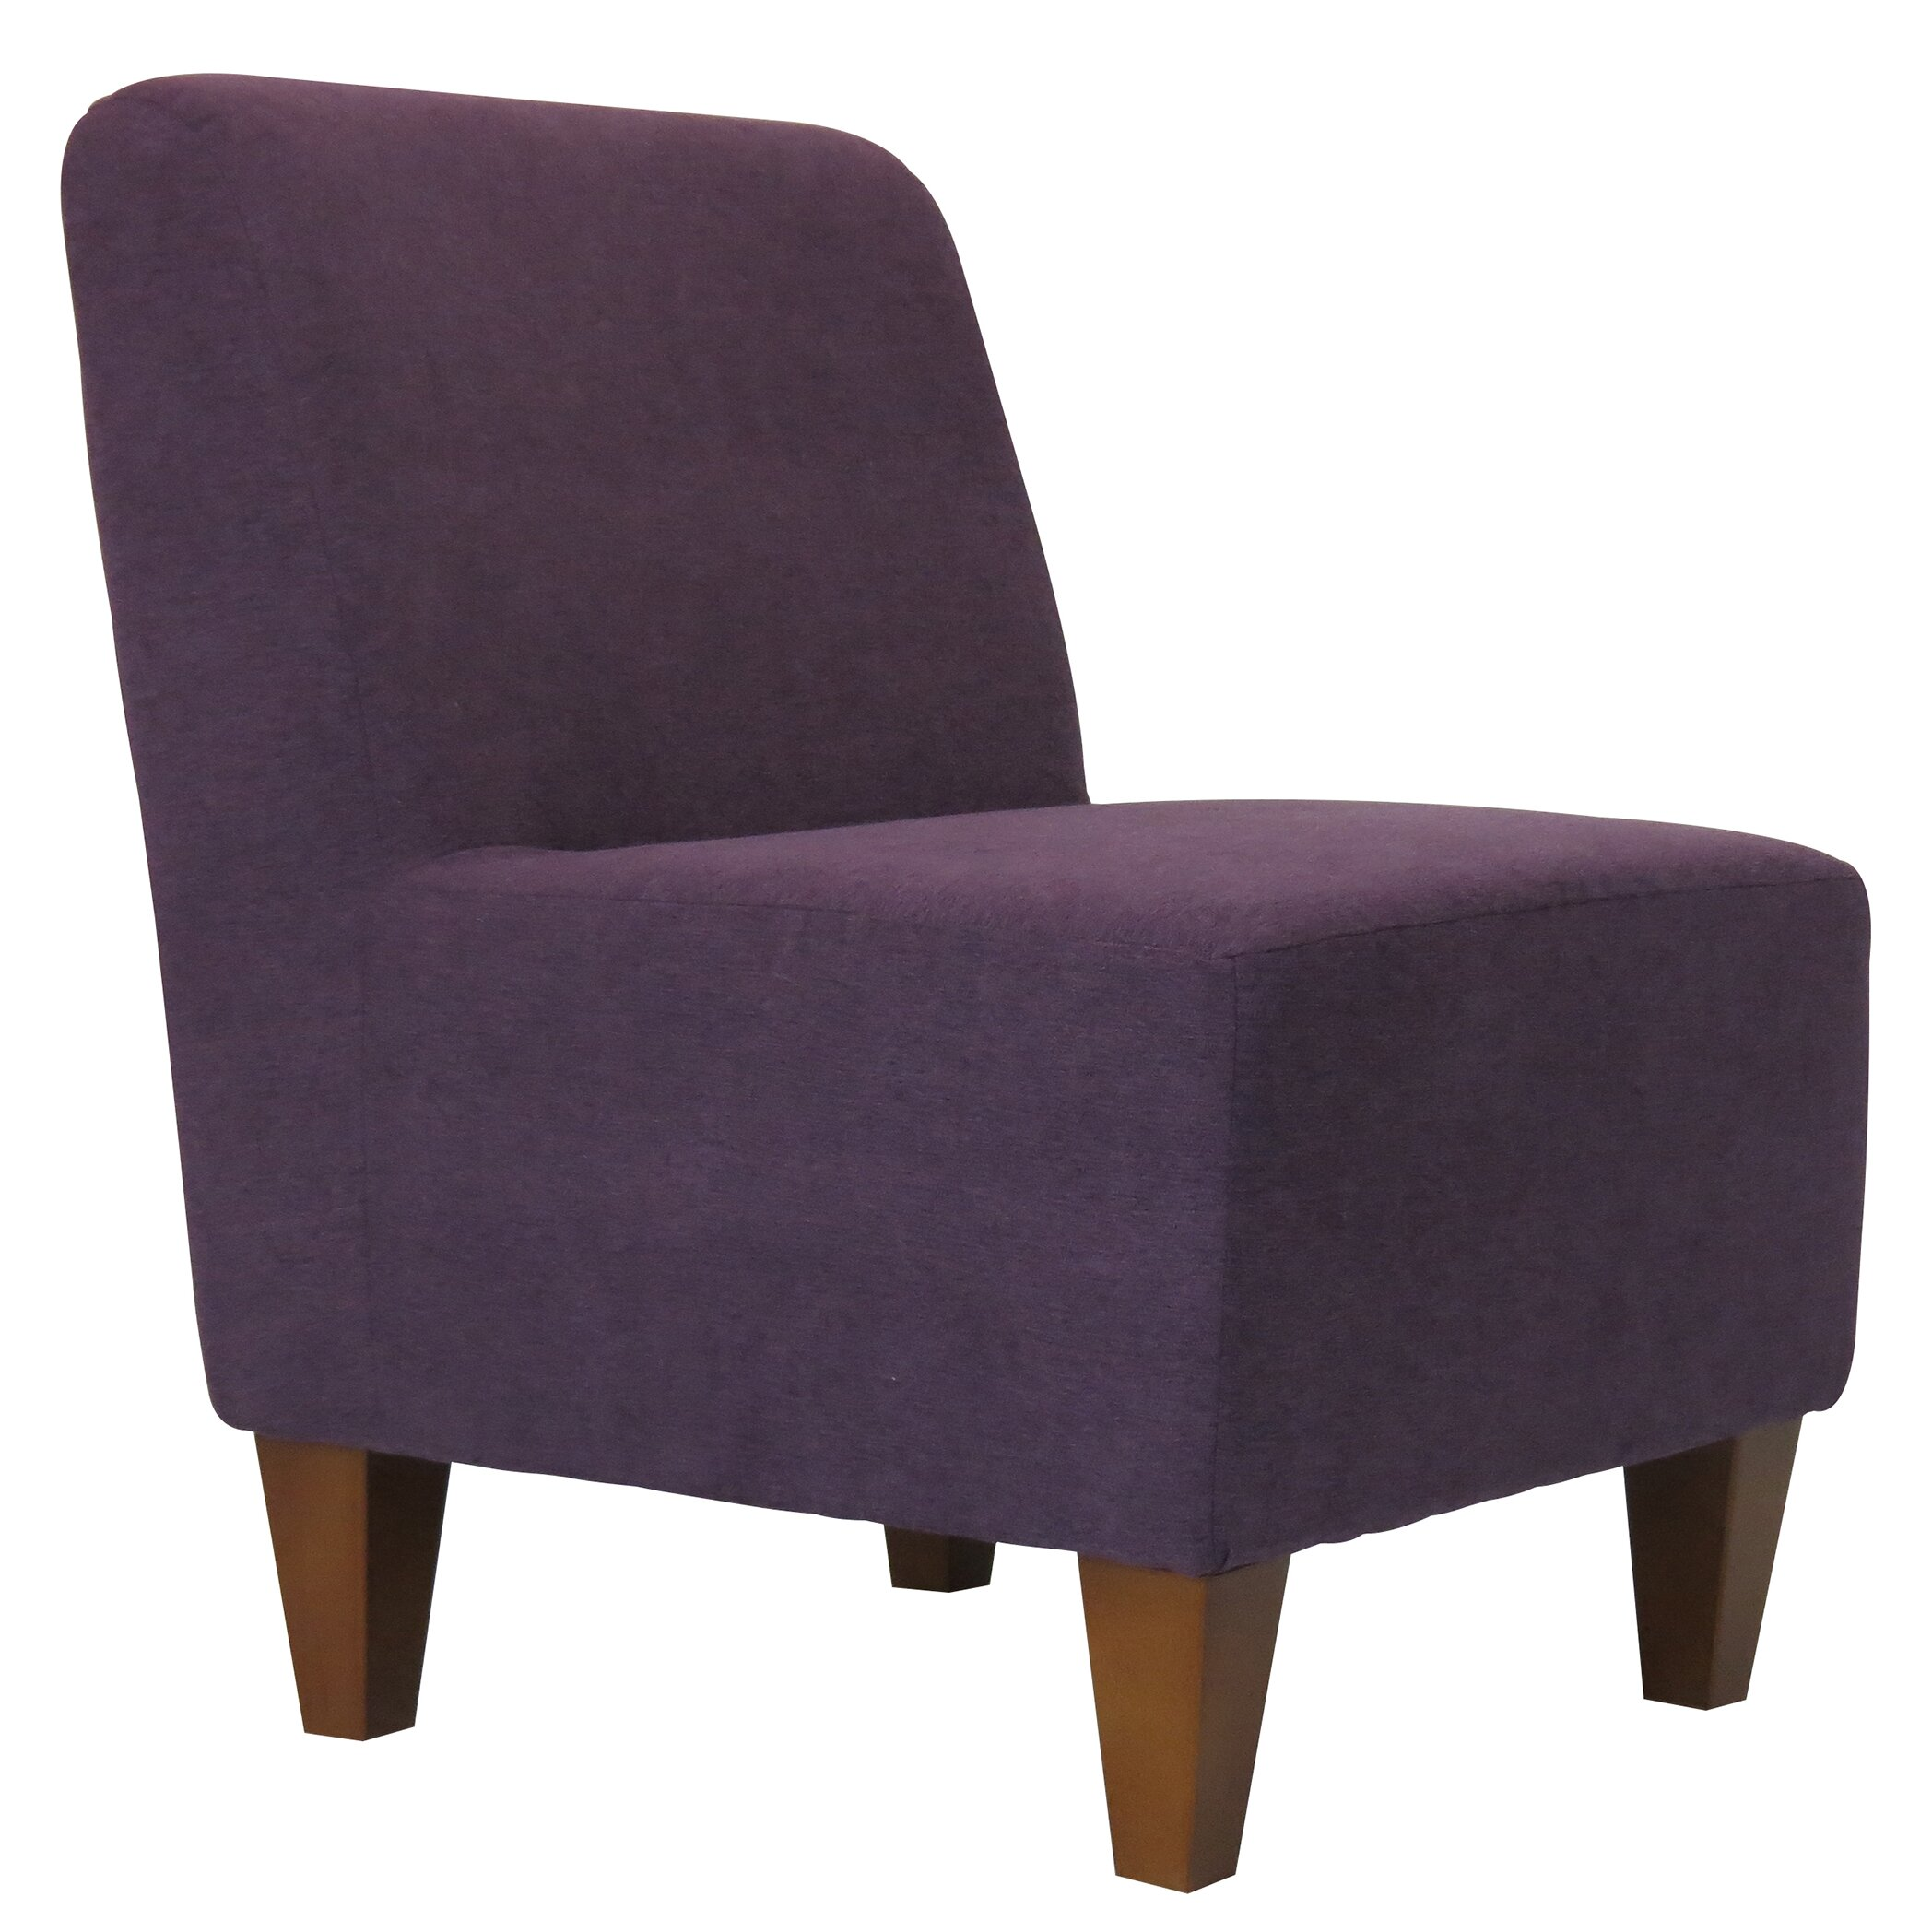 Fox Hill Trading Penelope Armless Slipper Chair & Reviews  Wayfair